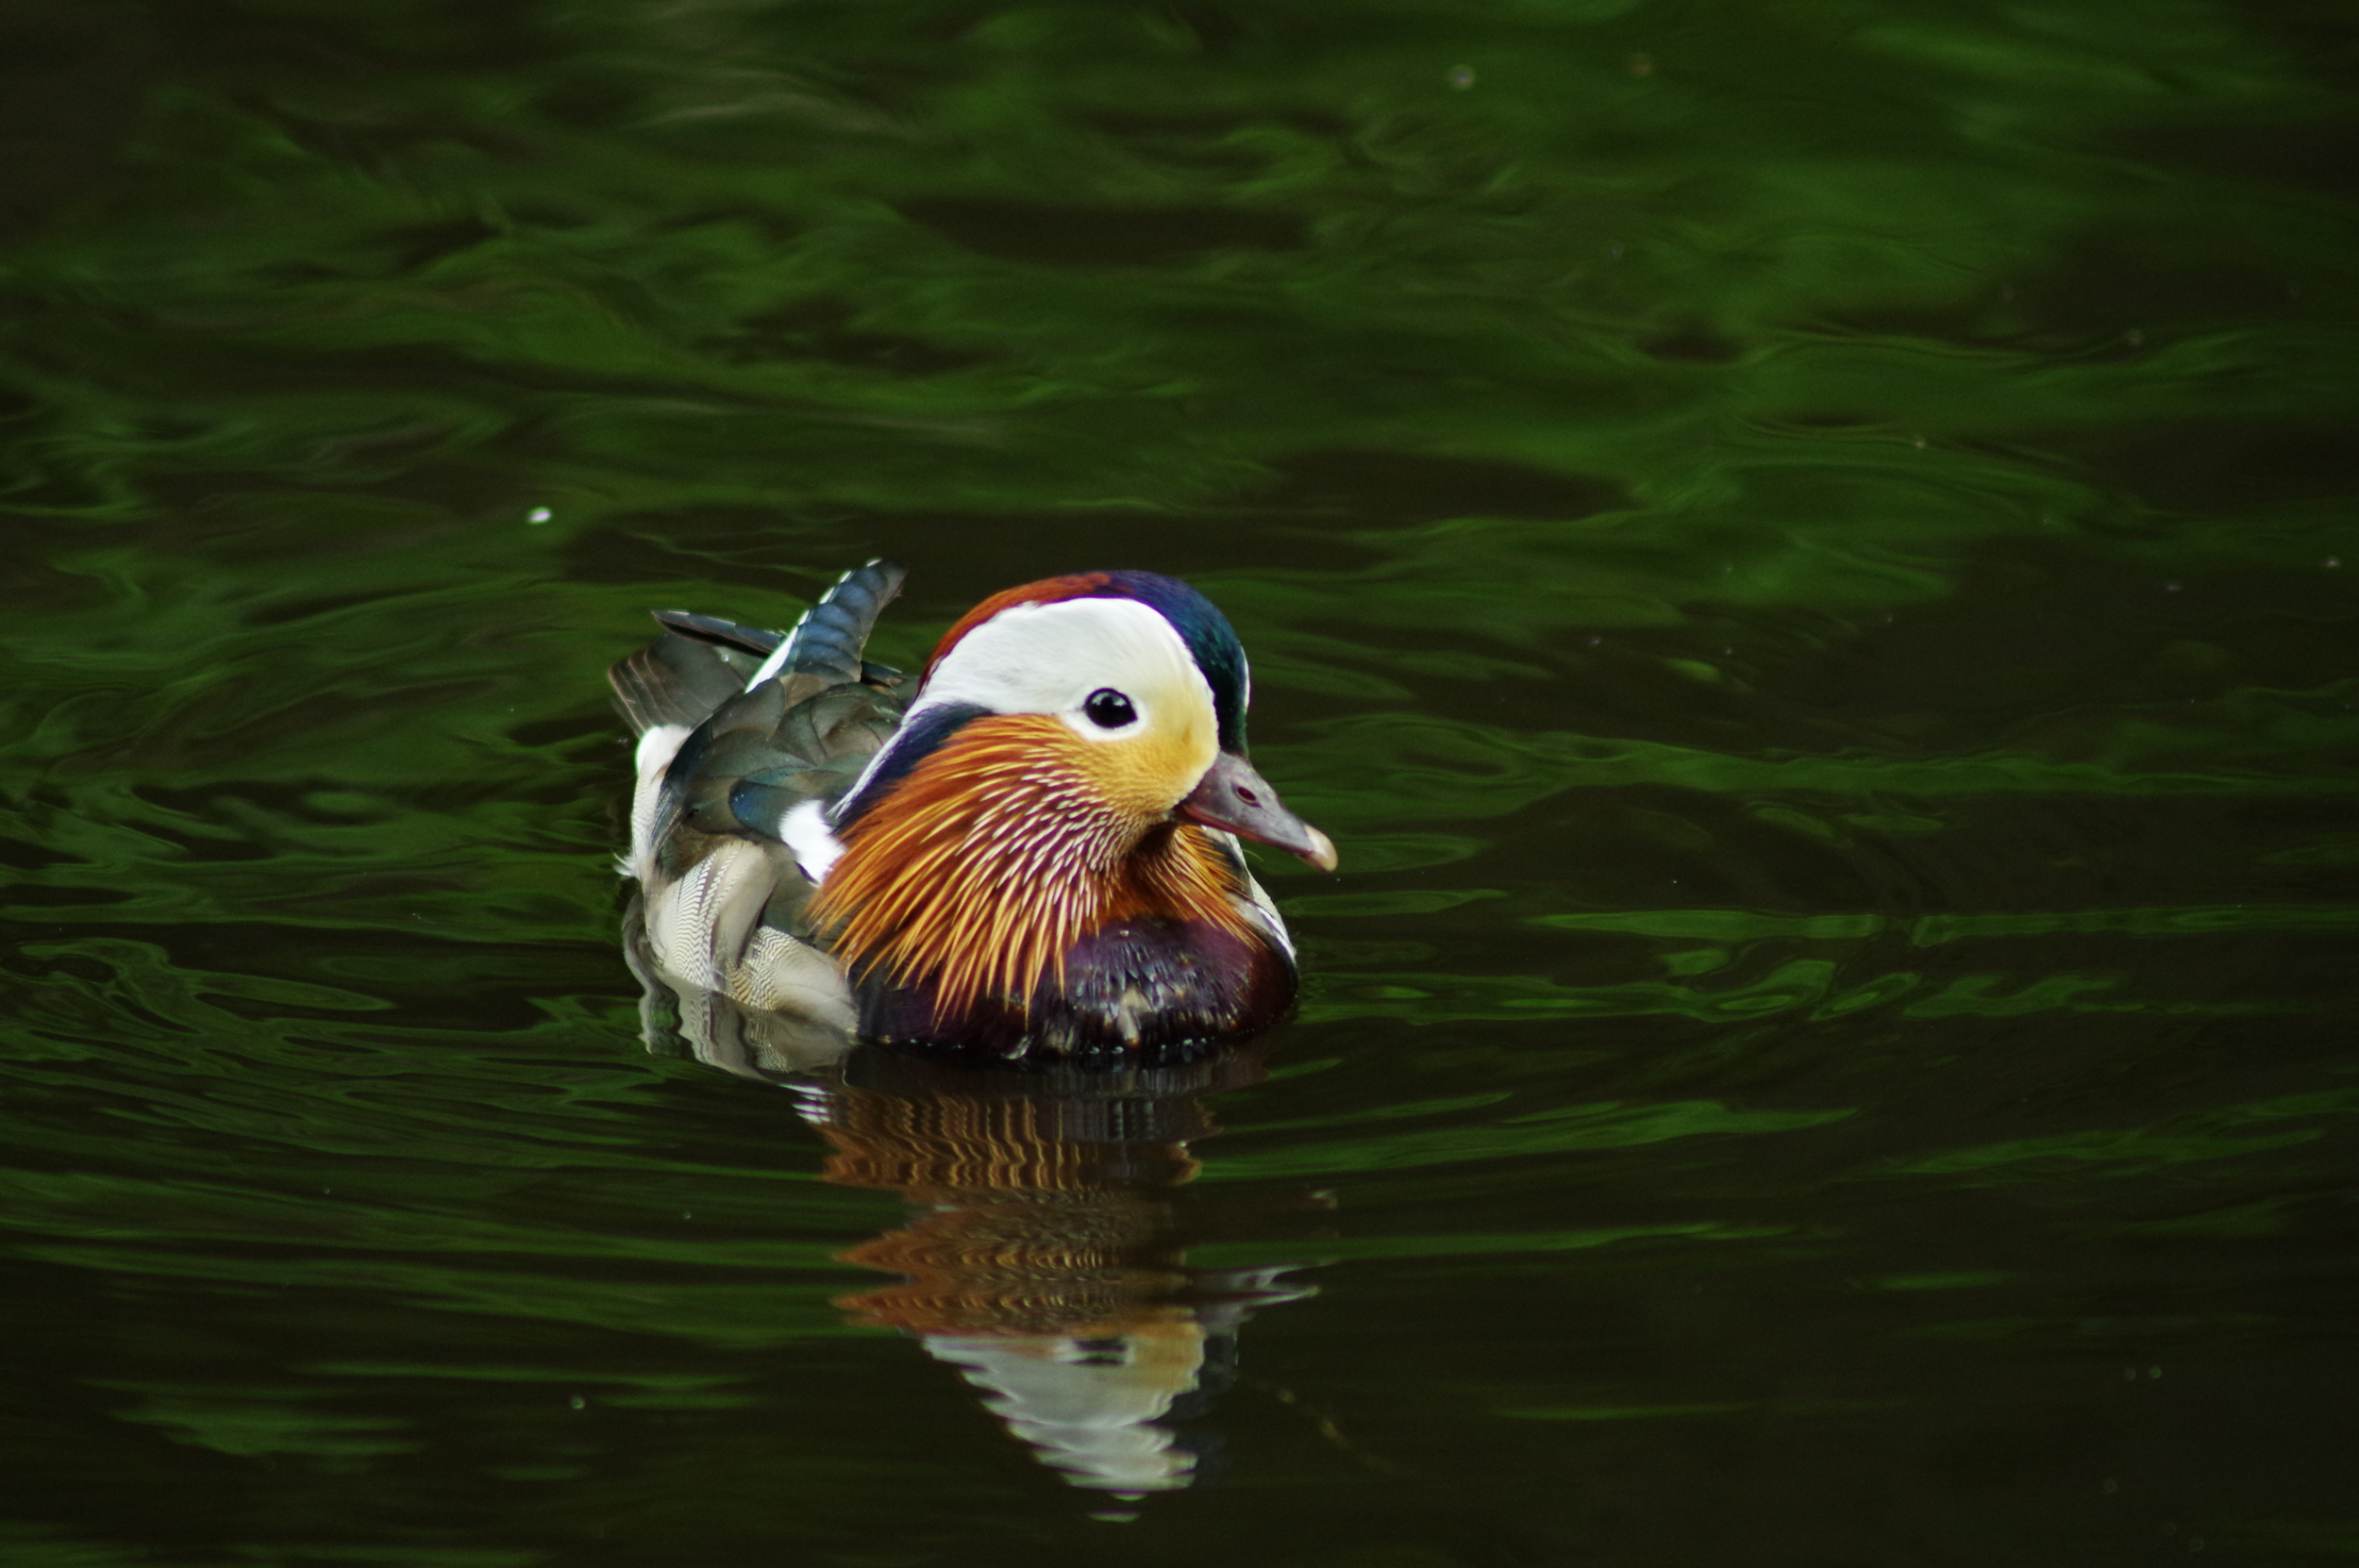 Mandarian Duck and Reflection #3